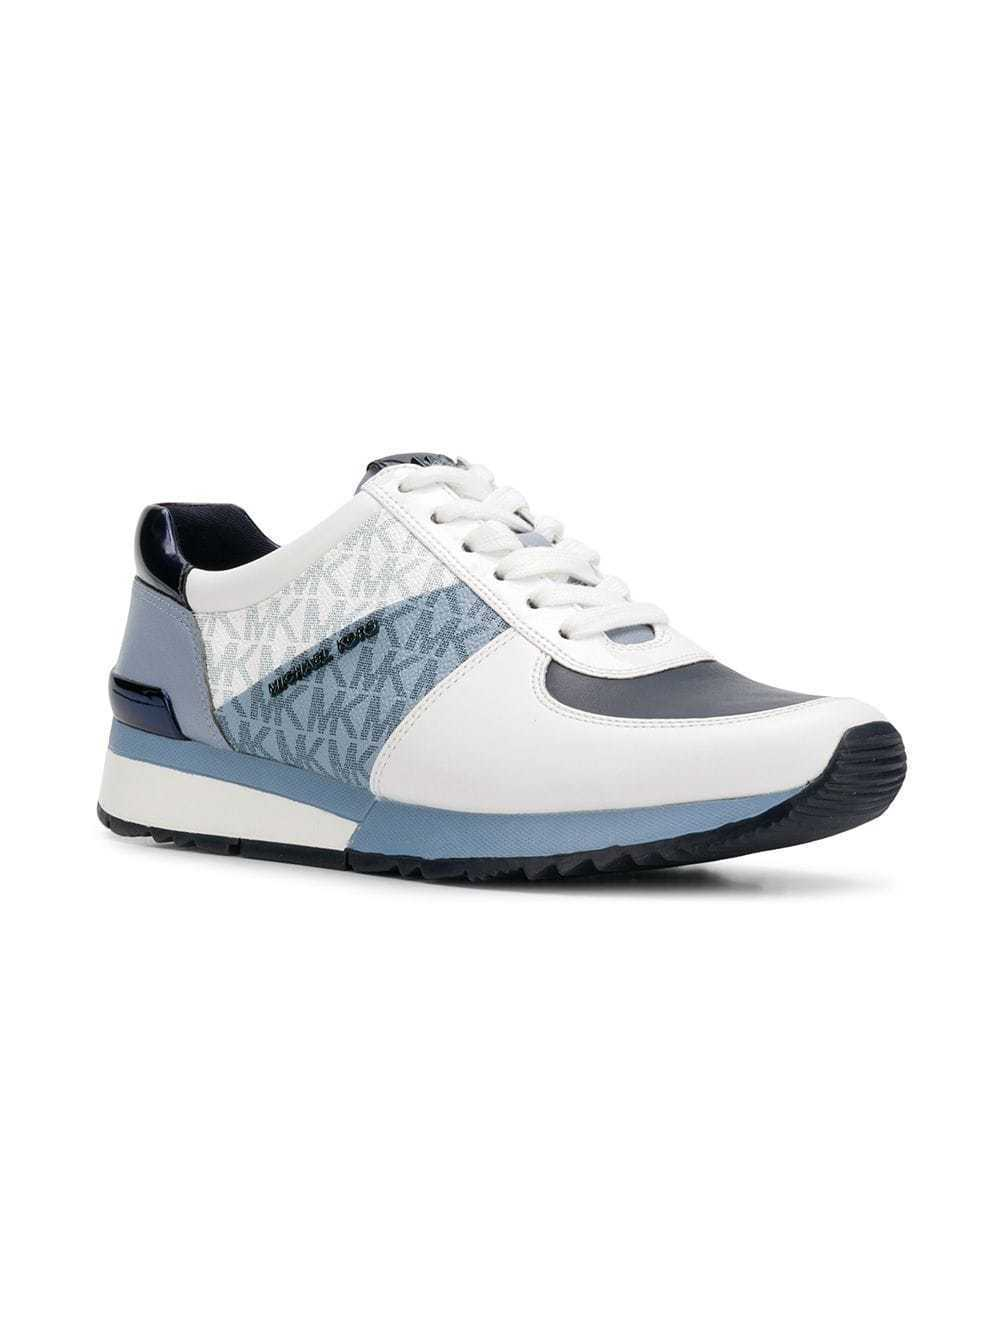 Michael Kors Women's Allie Trainer Mini MK Logo Sneakers Shoes ADM/PLBL/OPW